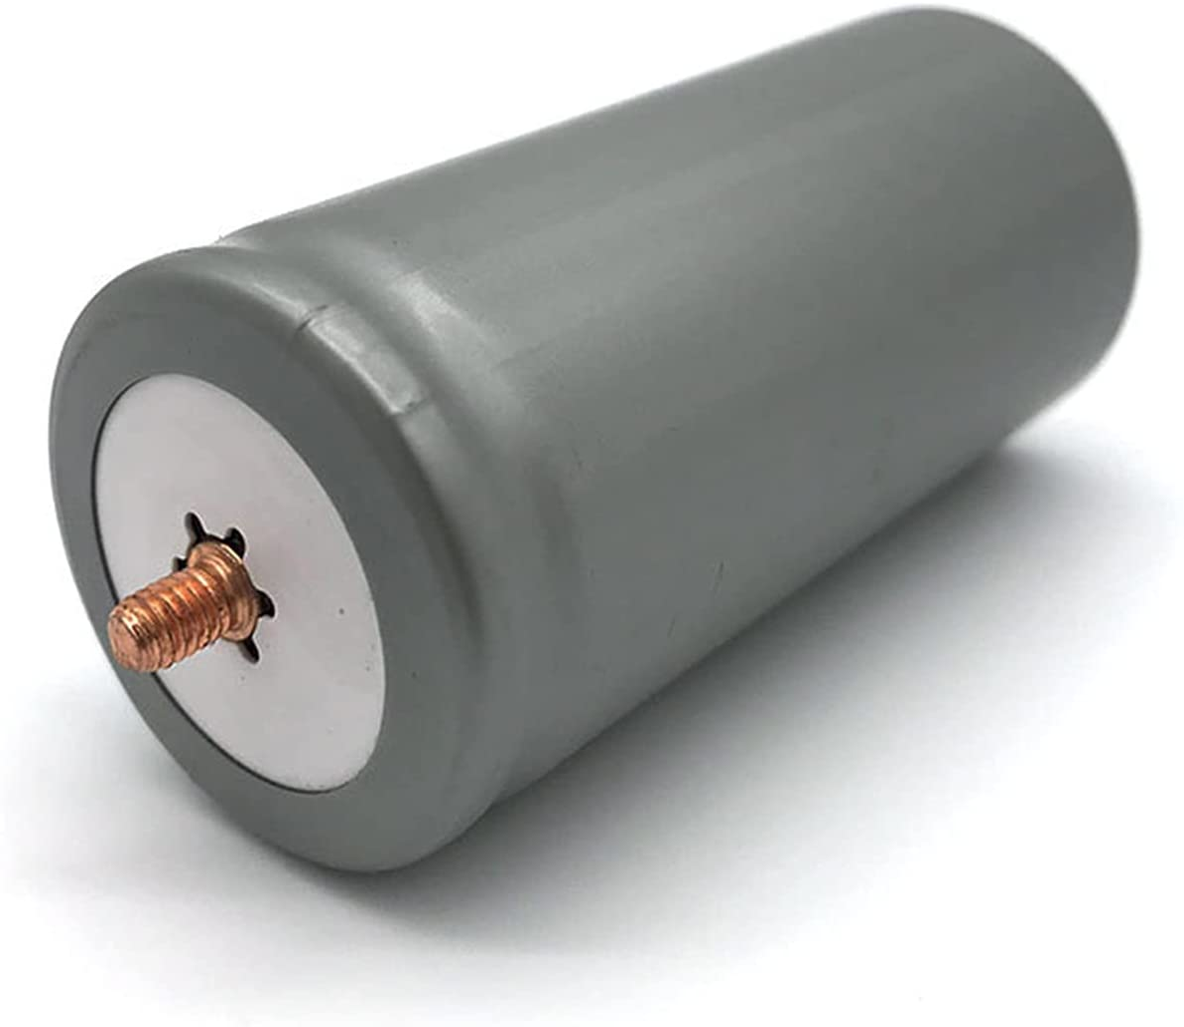 RIYIFER Células Lifepo4 Cilíndricas De Clase A 3,2 V 5000 Mah, Pilas De Fosfato De Hierro Y Litio 12 V 24 V 48 V 5000 Mah 32700 Baterías para Bicicleta Eléctrica Solar RV,3.2v/5000mah,4pcs